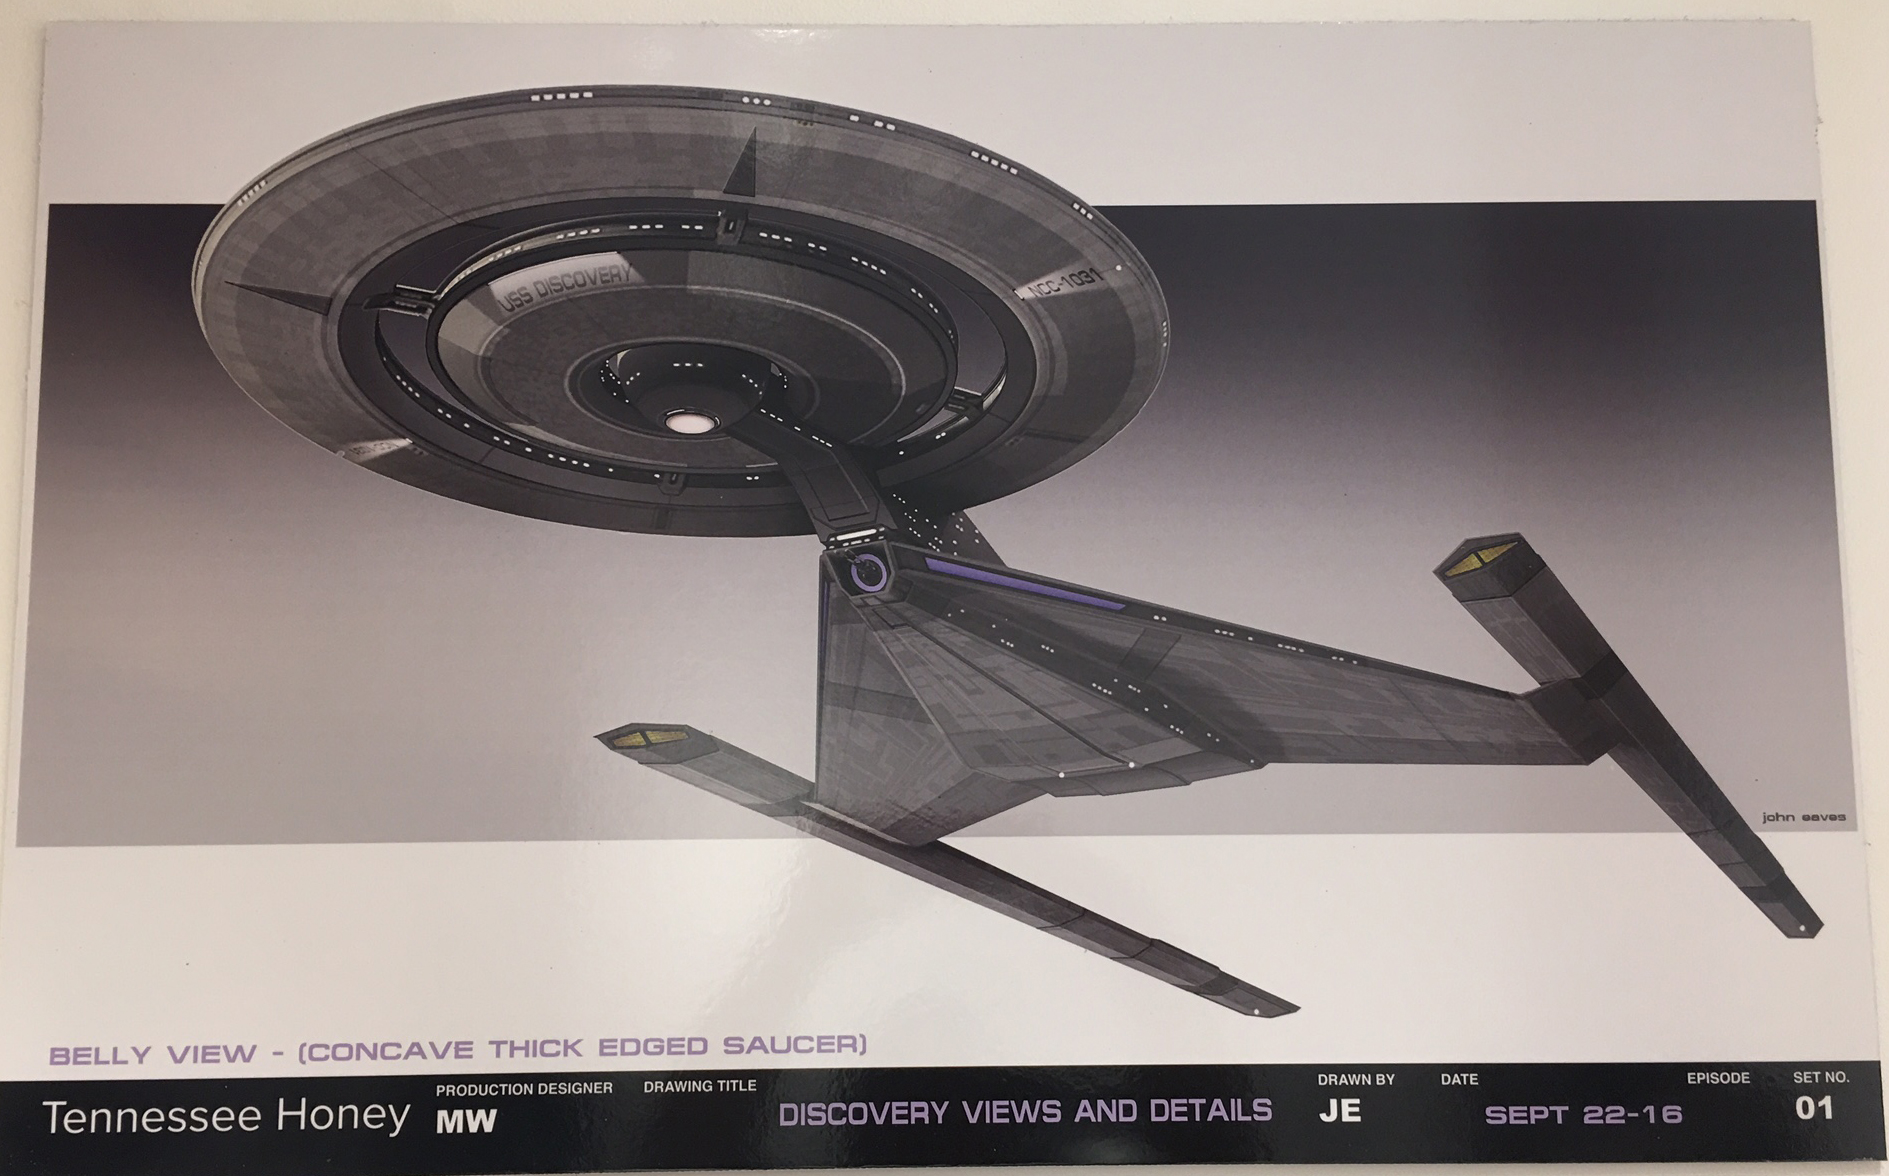 startrek-discovery-exhibit-photo53.jpg